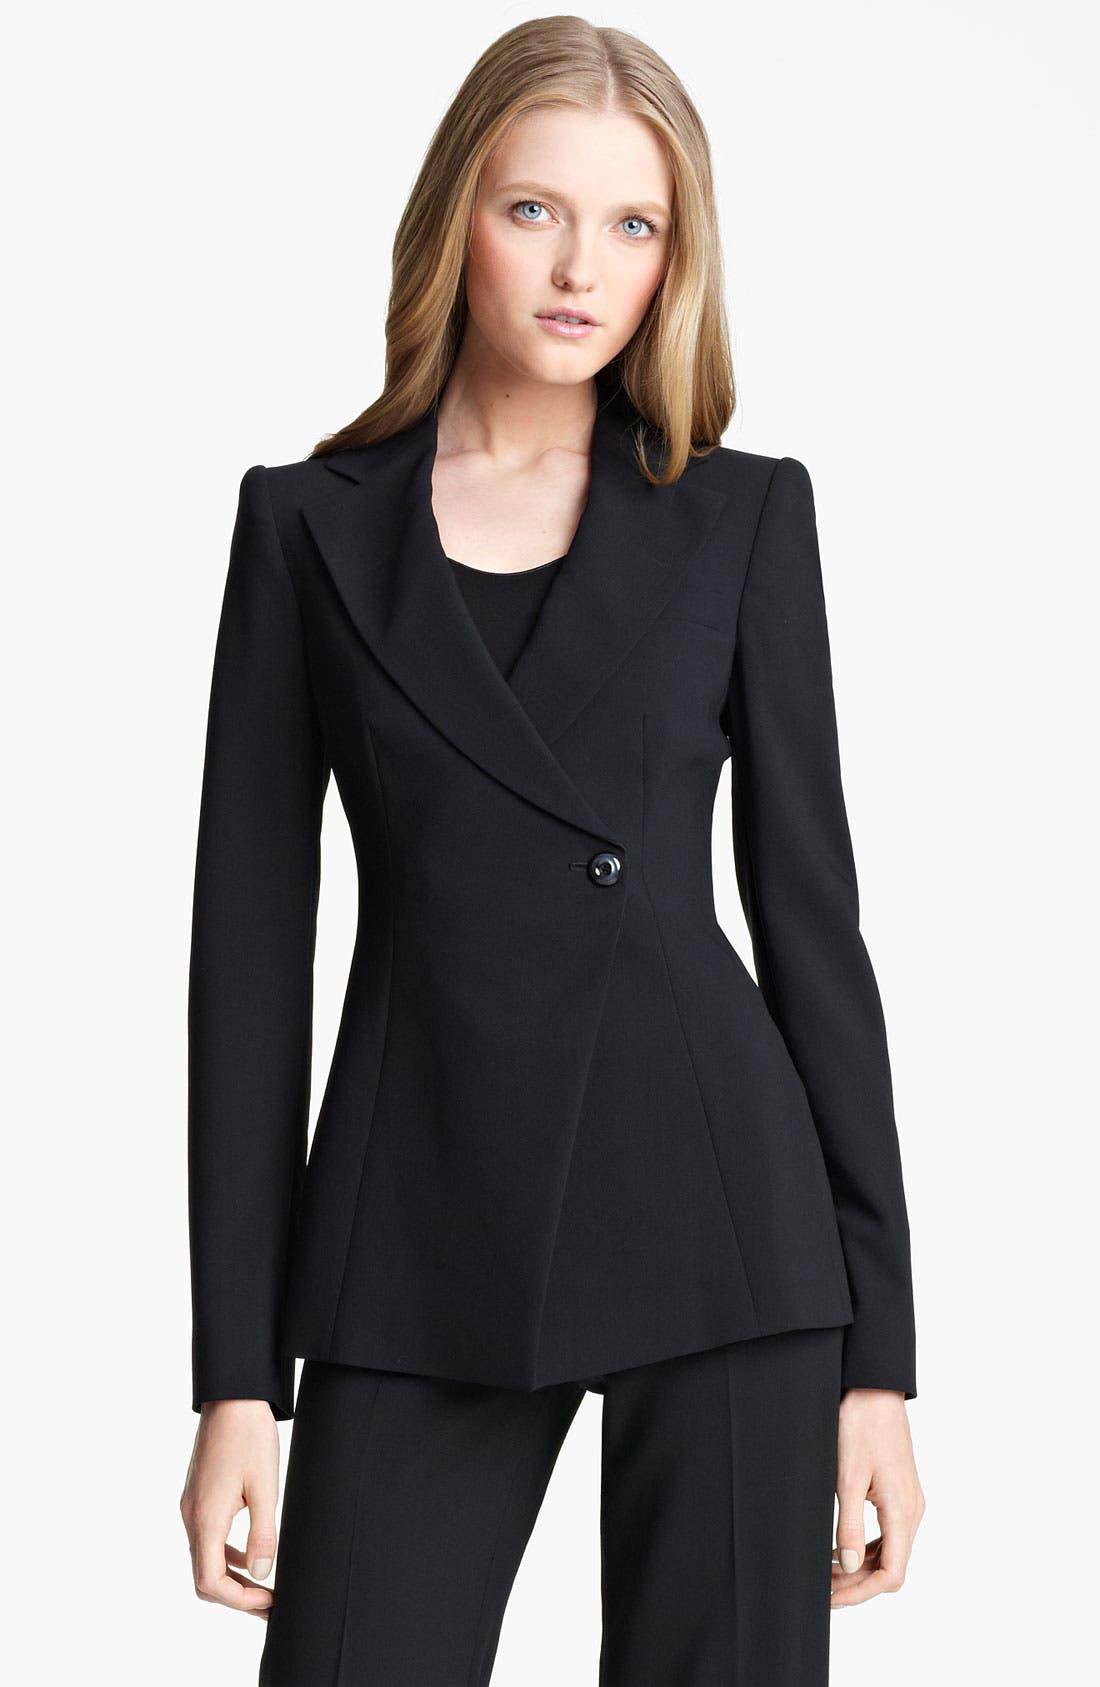 Alternate Image 1 Selected - Armani Collezioni Asymmetrical Featherweight Wool Jacket